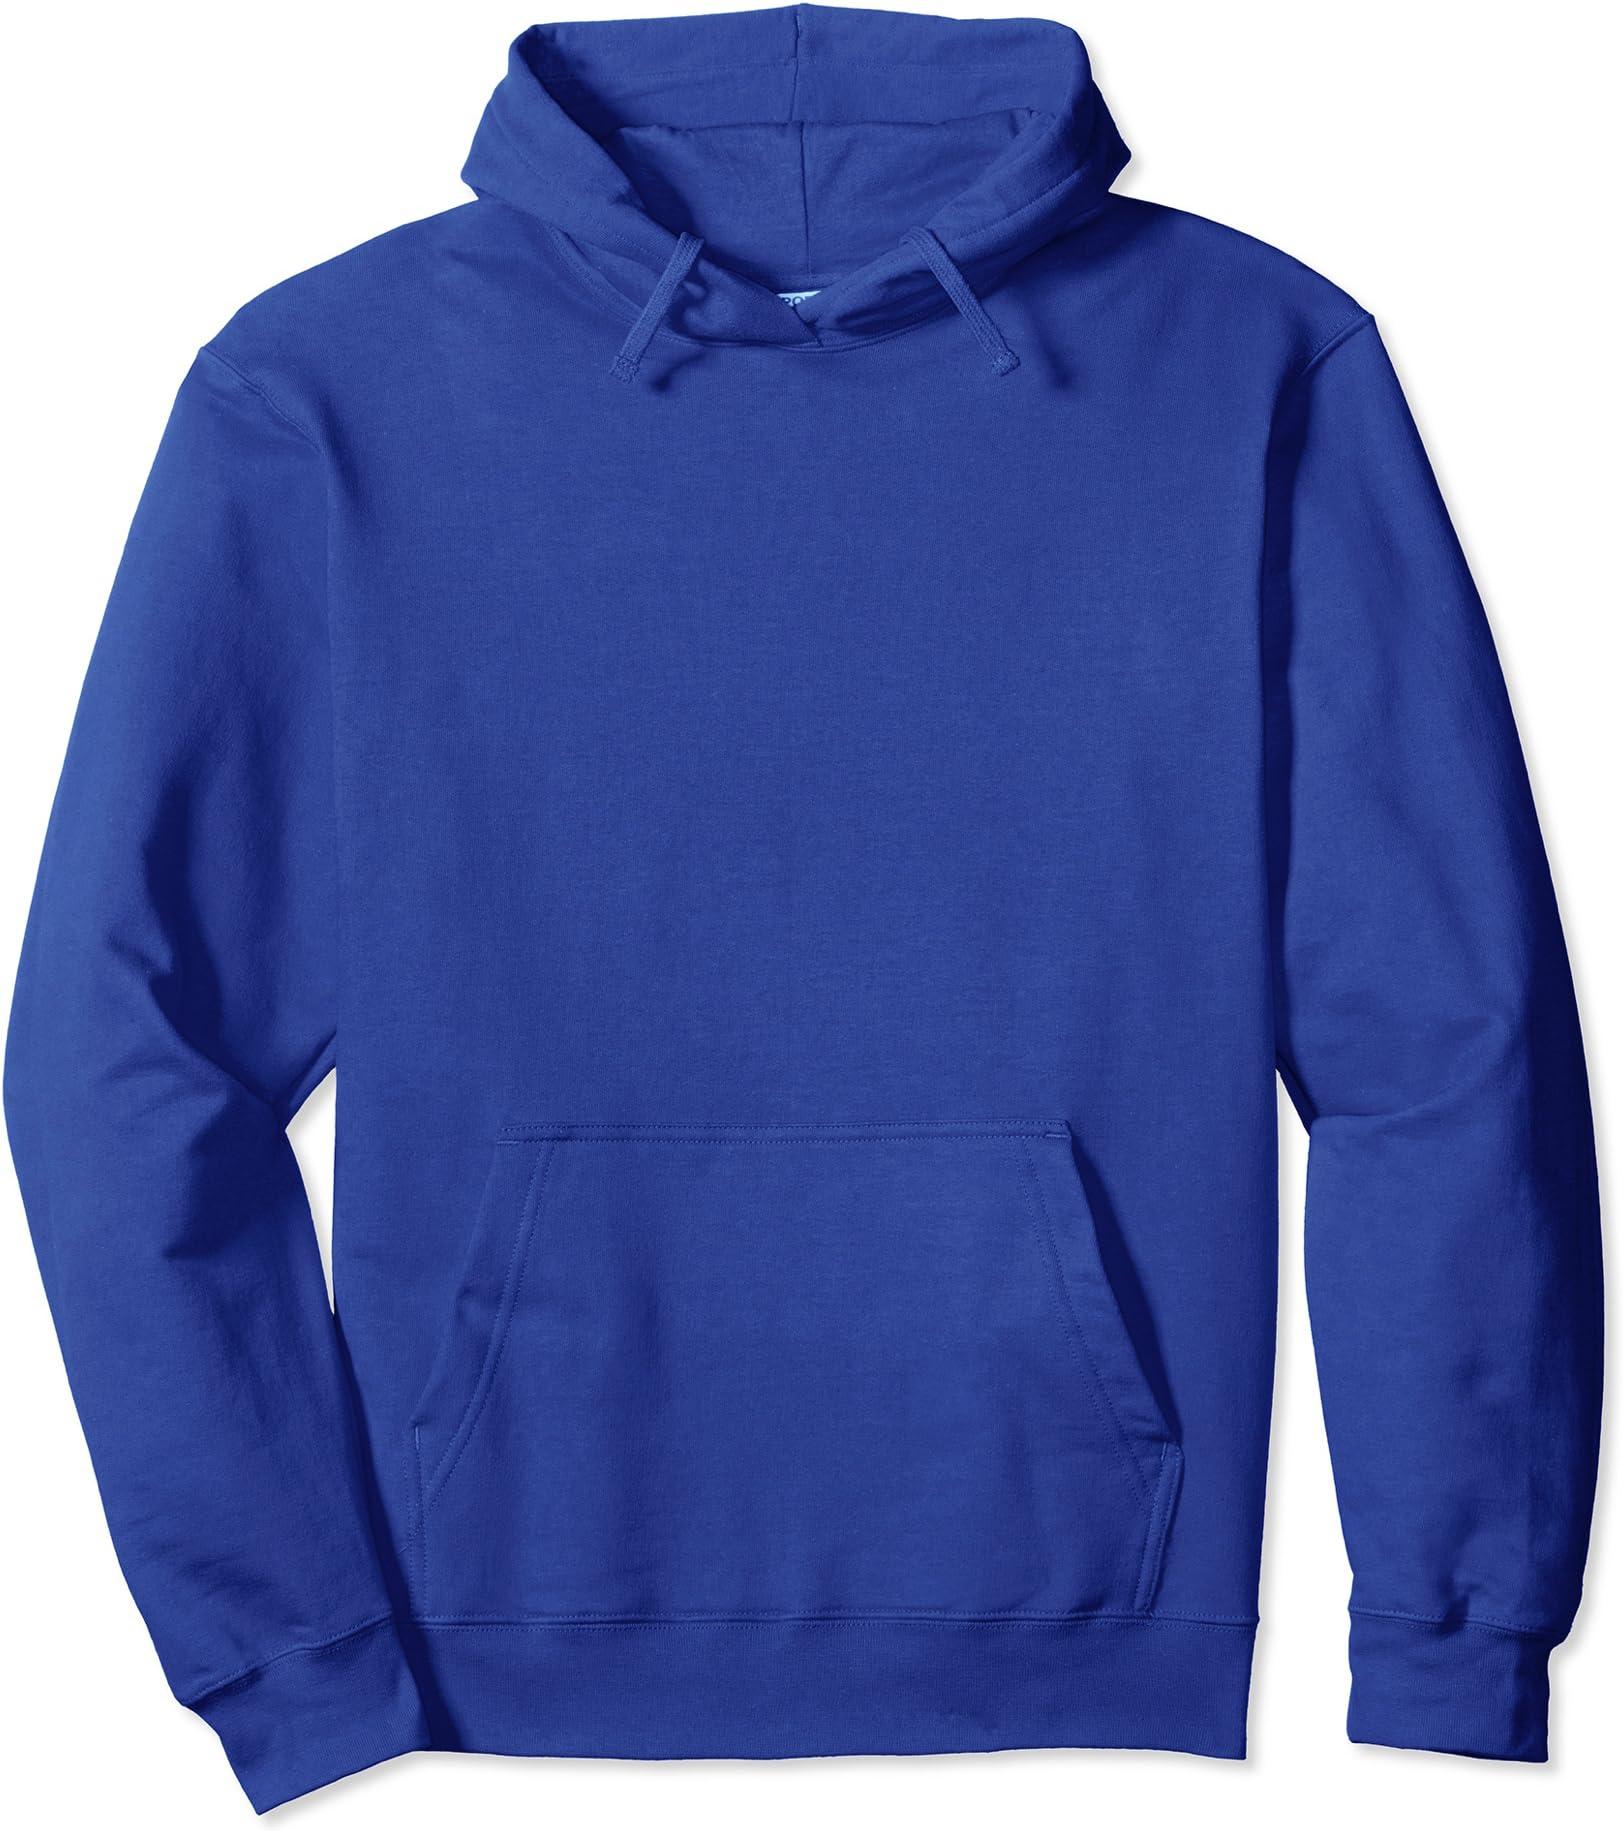 Mens Long Sleeve Cotton Hoodie Every Great Mom Says F Word.png Sweatshirt